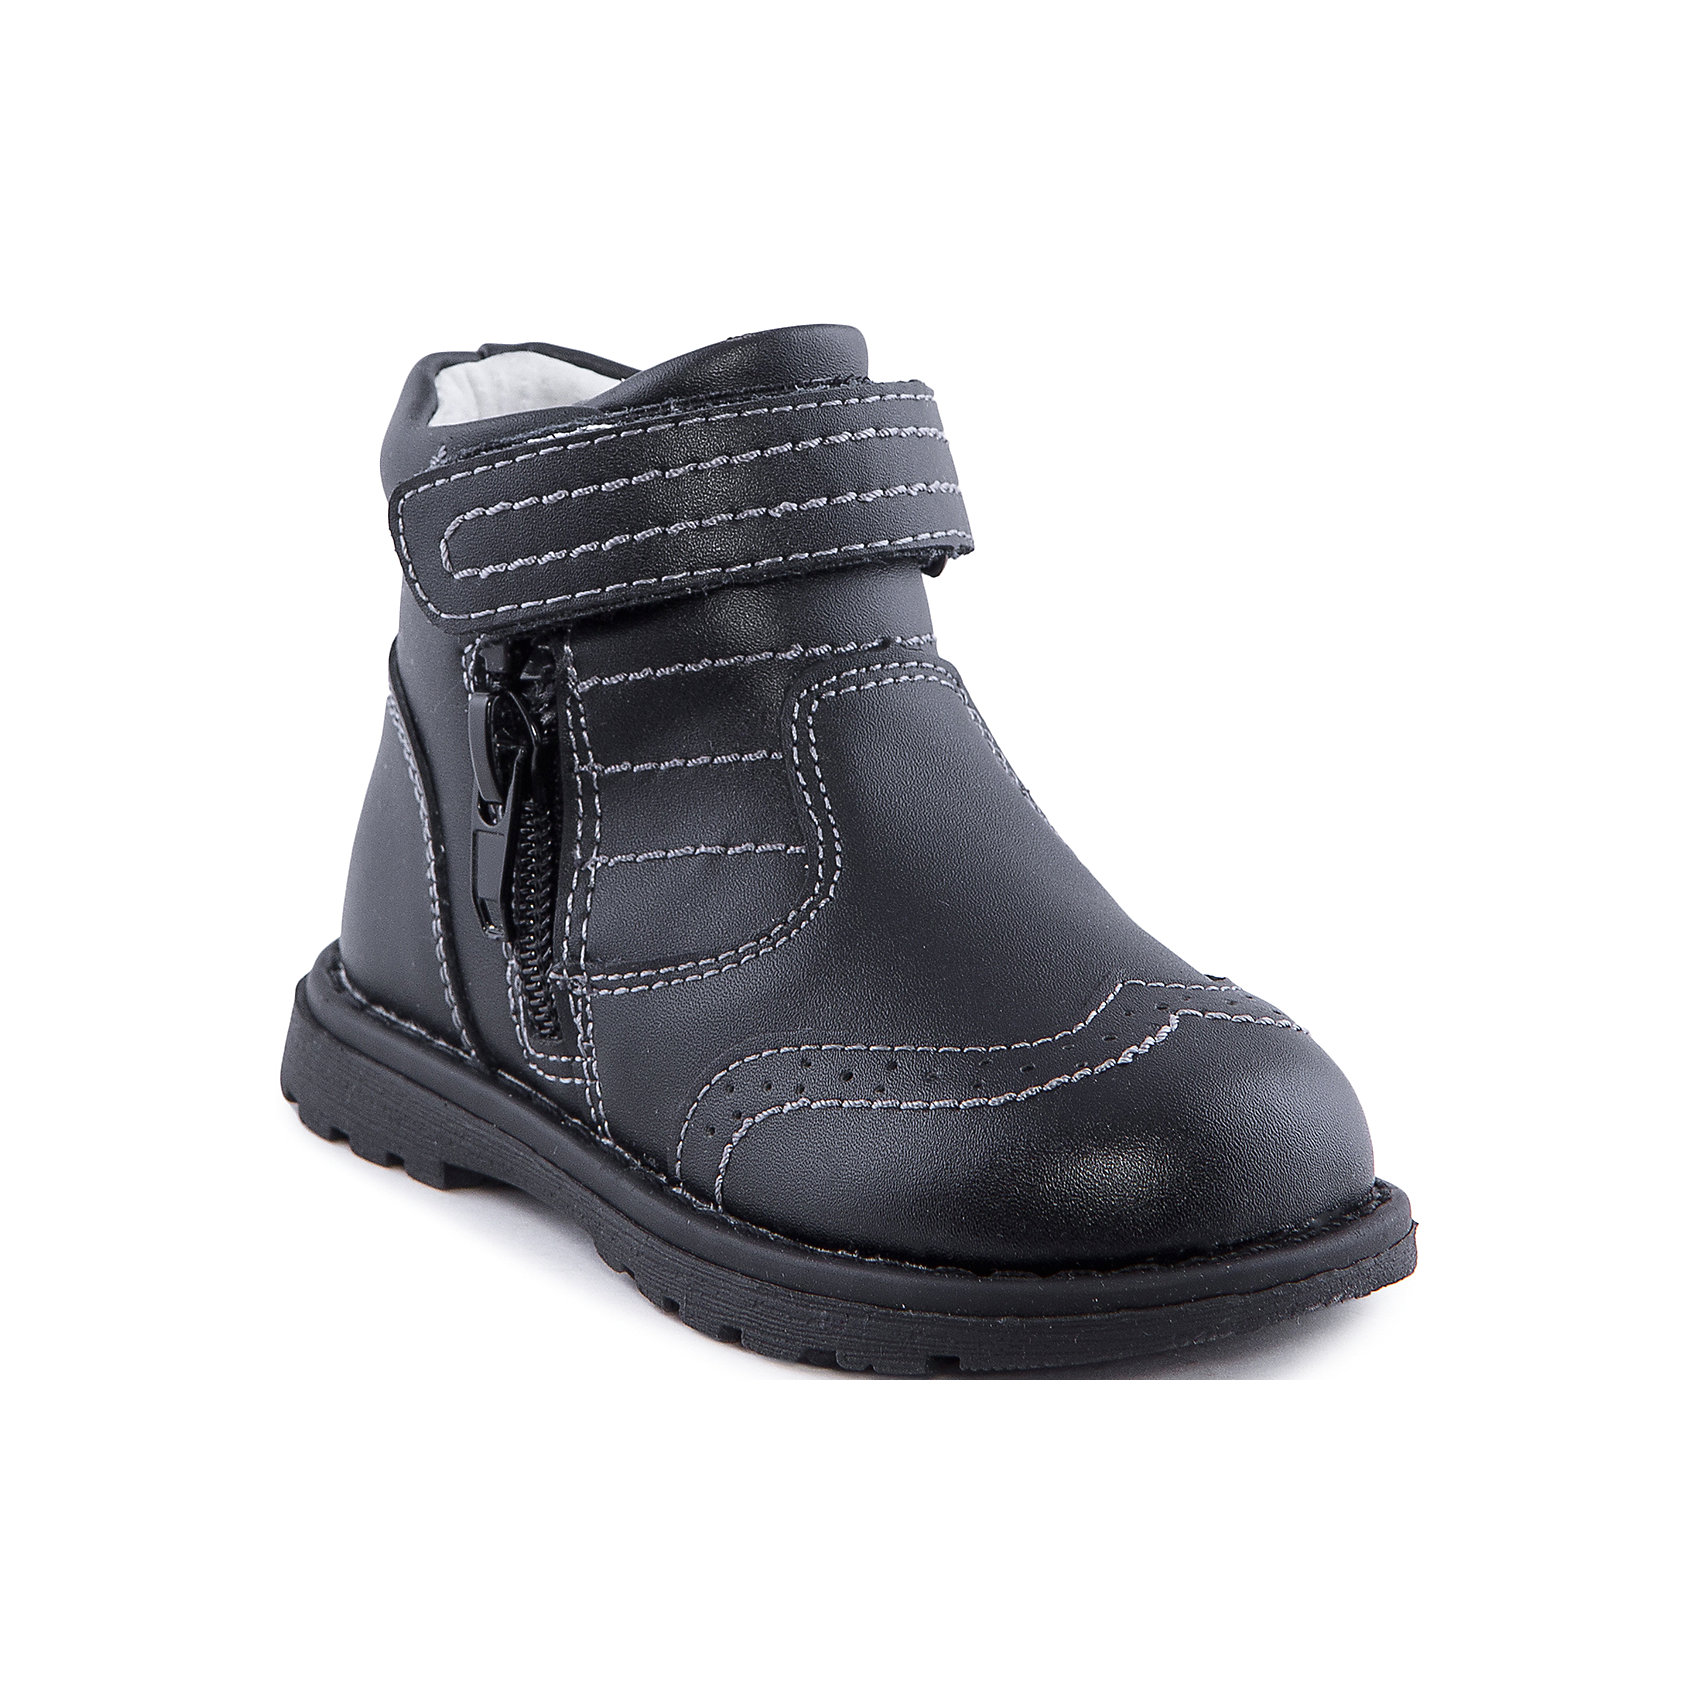 MURSU Ботинки для мальчика MURSU ботинки mursu 200240 черный р 37